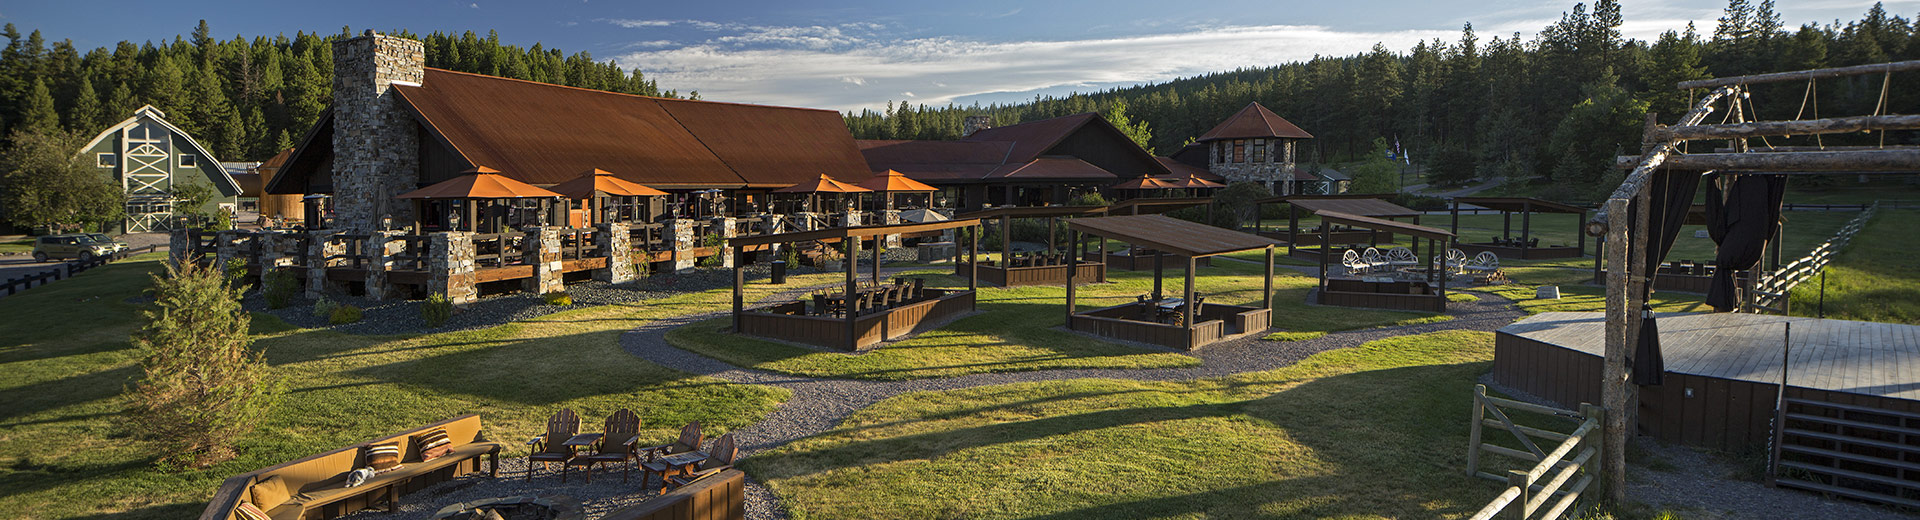 Montana Meetings and Groups